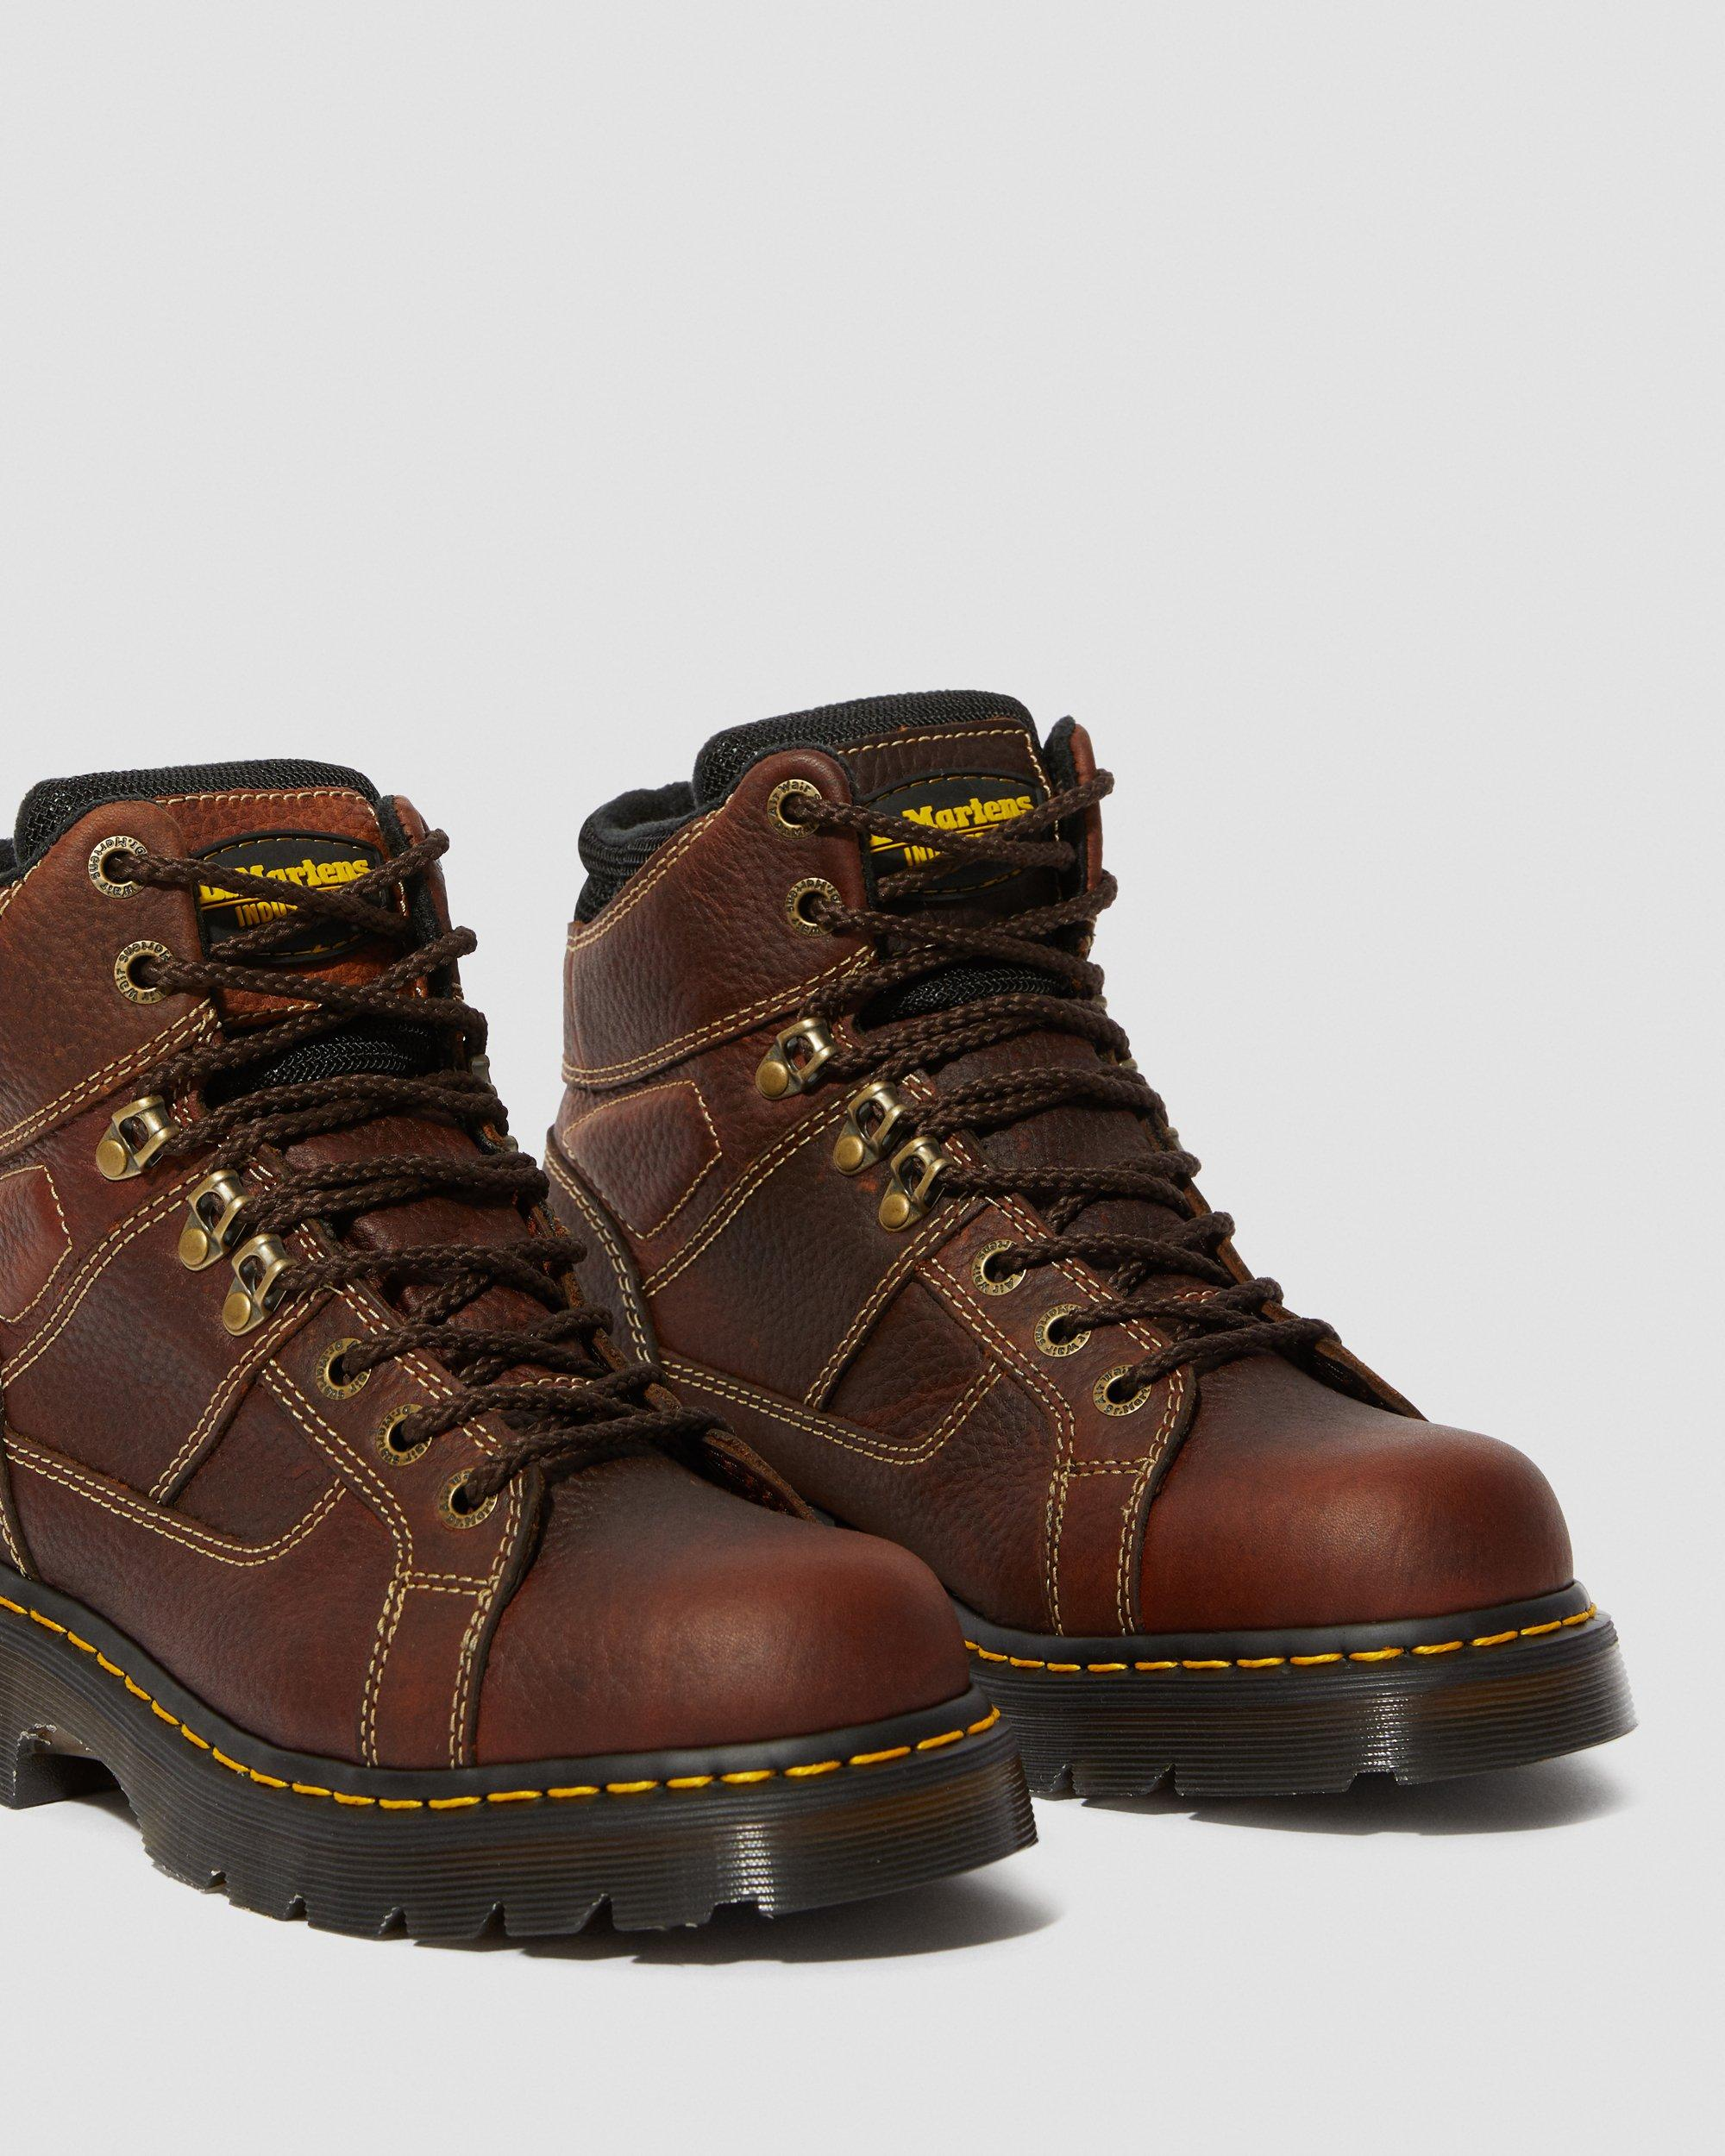 doc martens construction boots